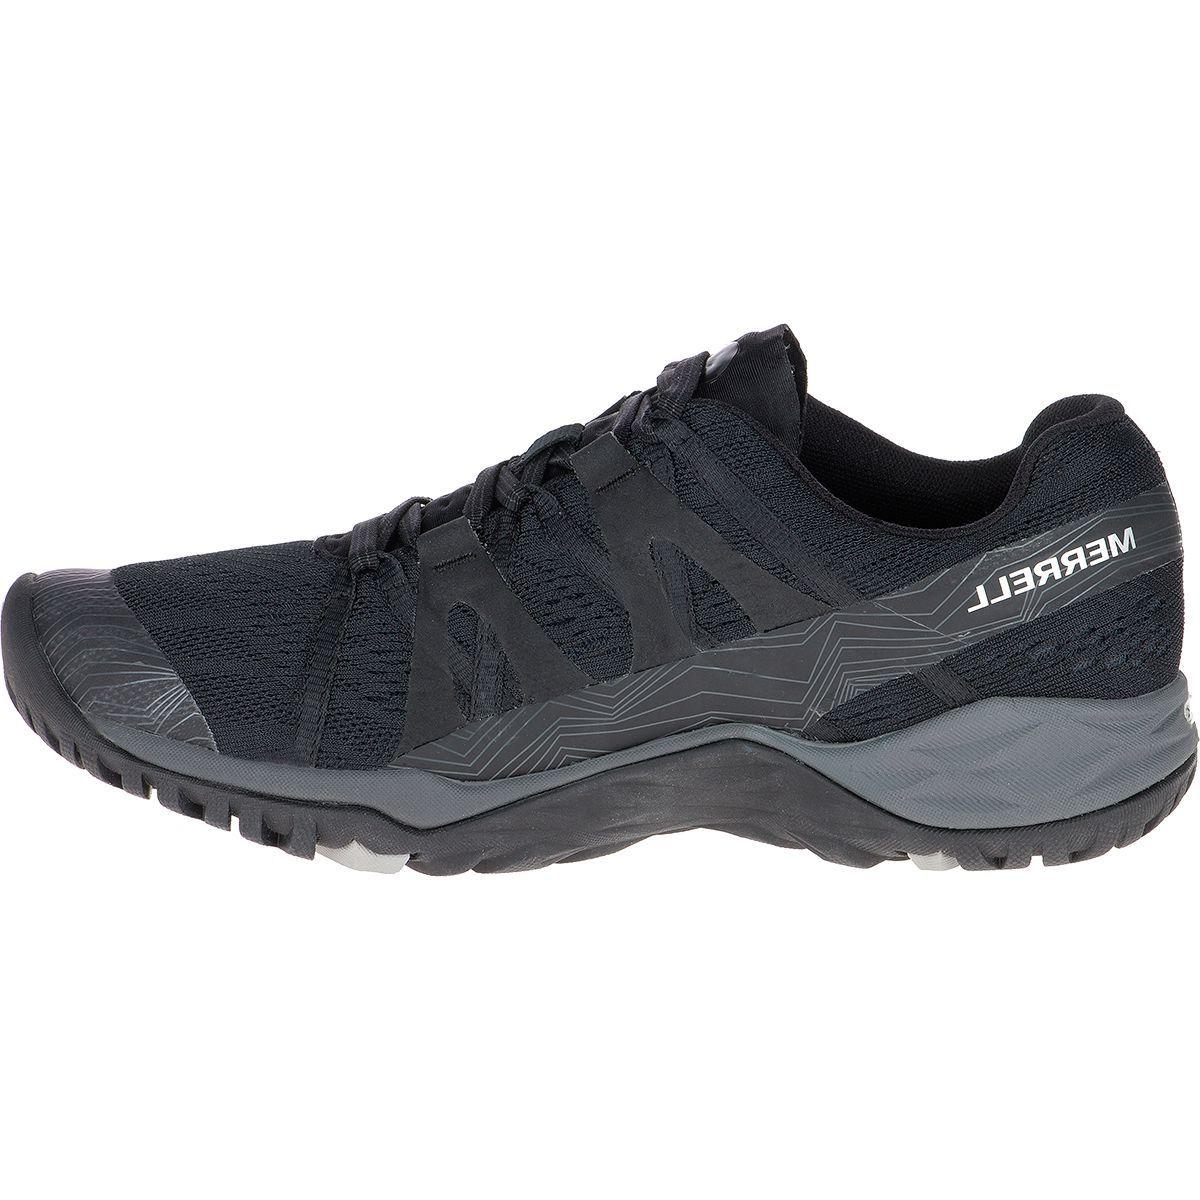 Merrell Siren Hex Q2 E-Mesh Hiking Shoe - Women's